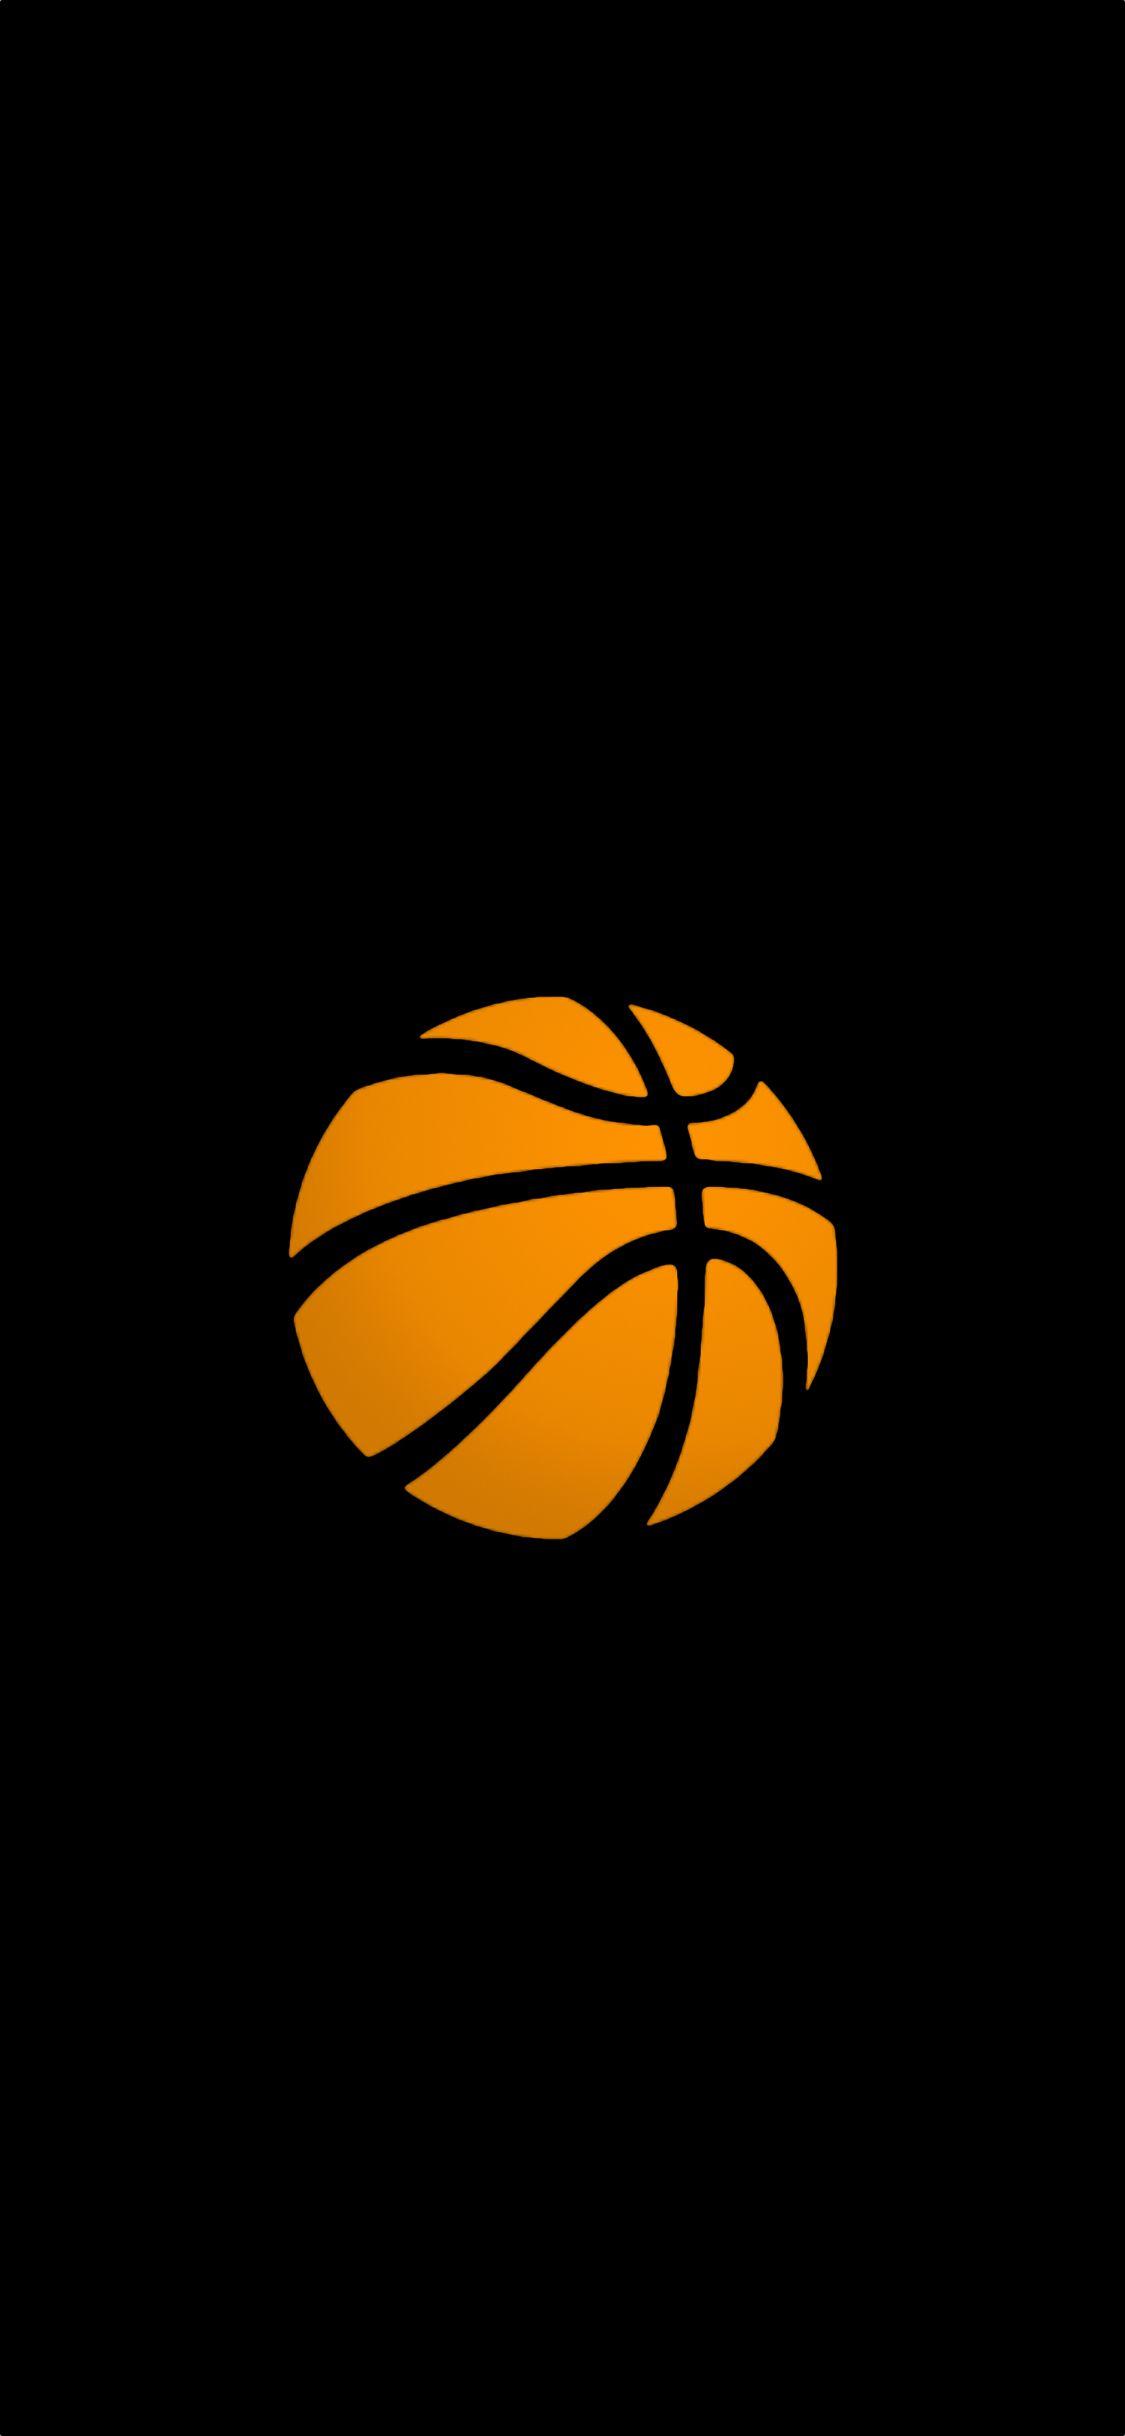 Basketball Iphone X Wallpaper Basketball Wallpaper Basketball Iphone Wallpaper Nba Wallpapers